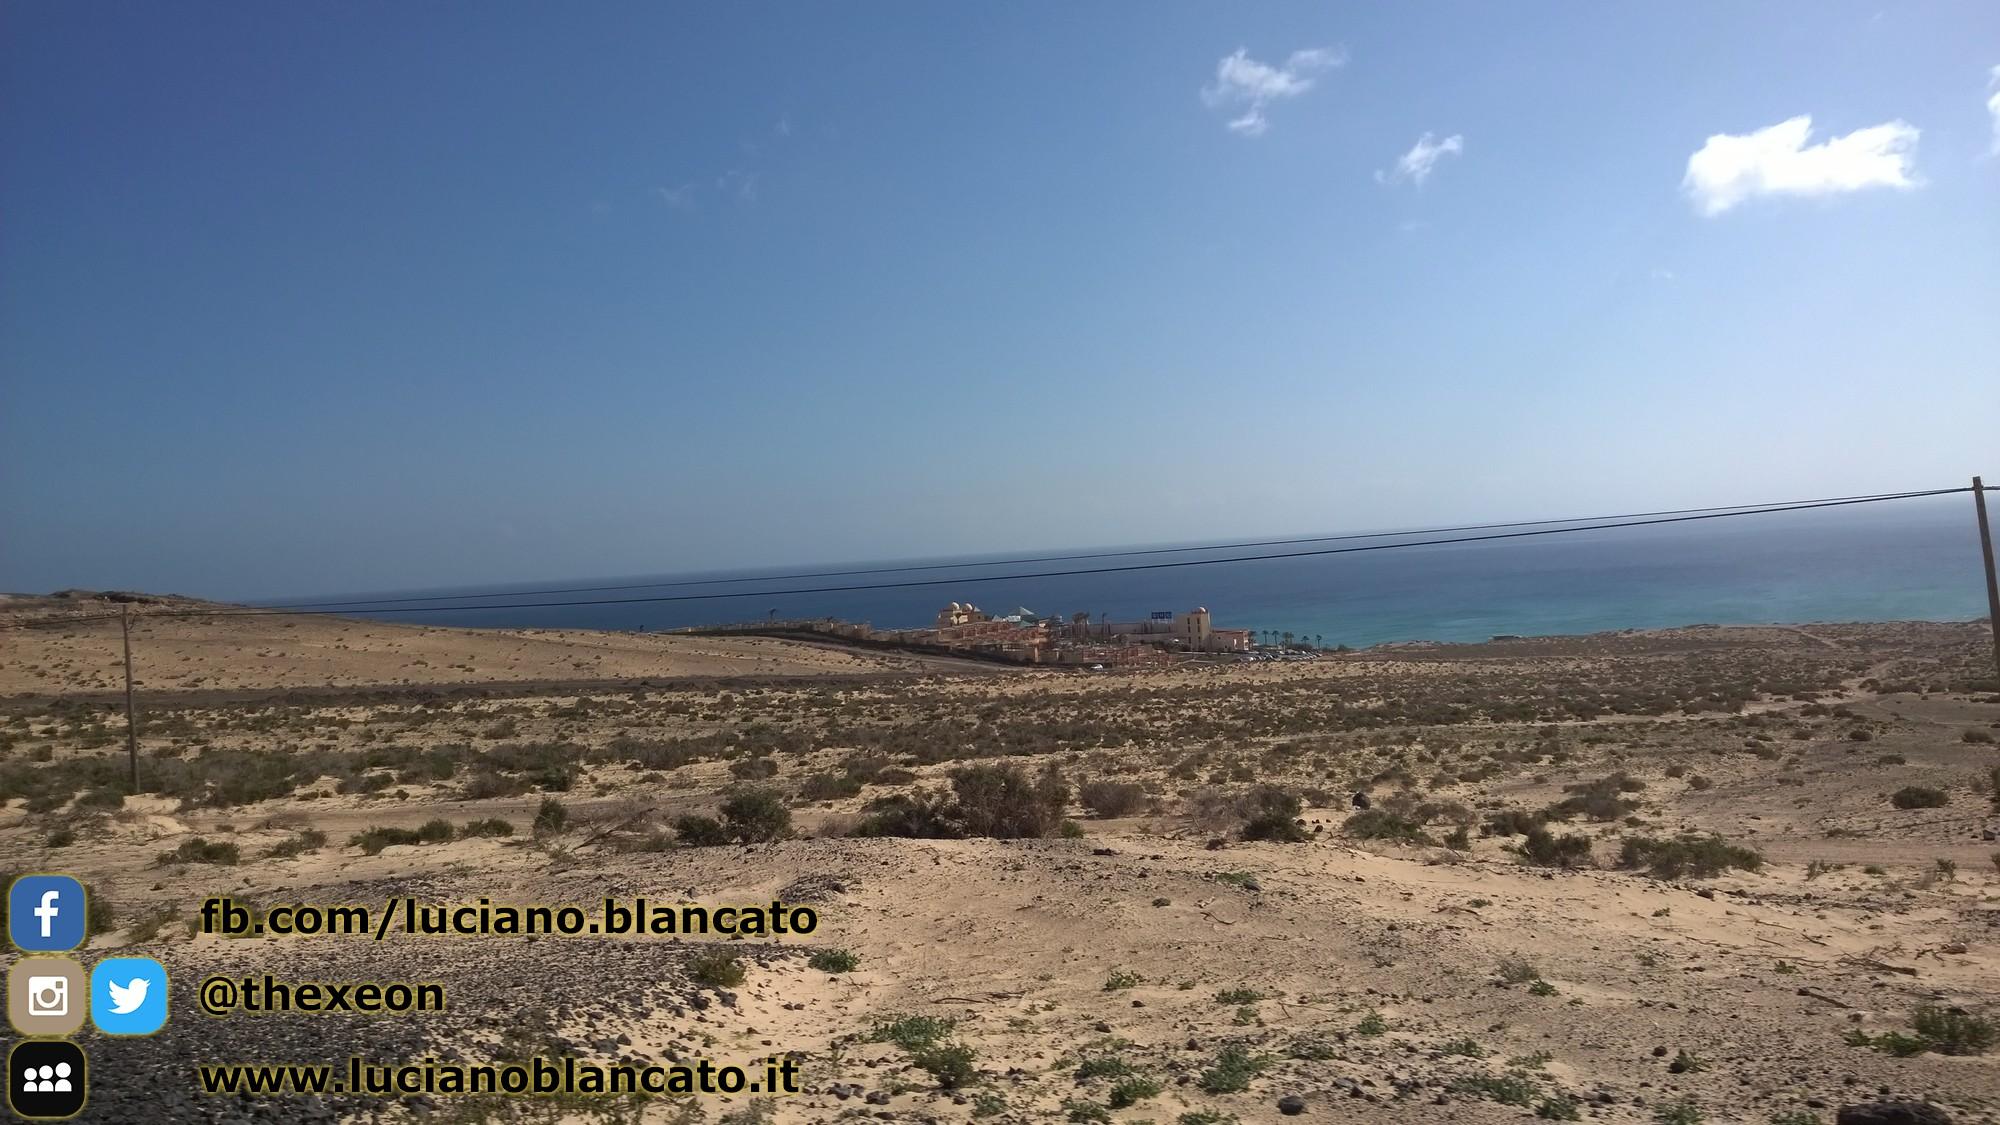 Fuerteventura - Spagna - 2014 - foto n. 0051